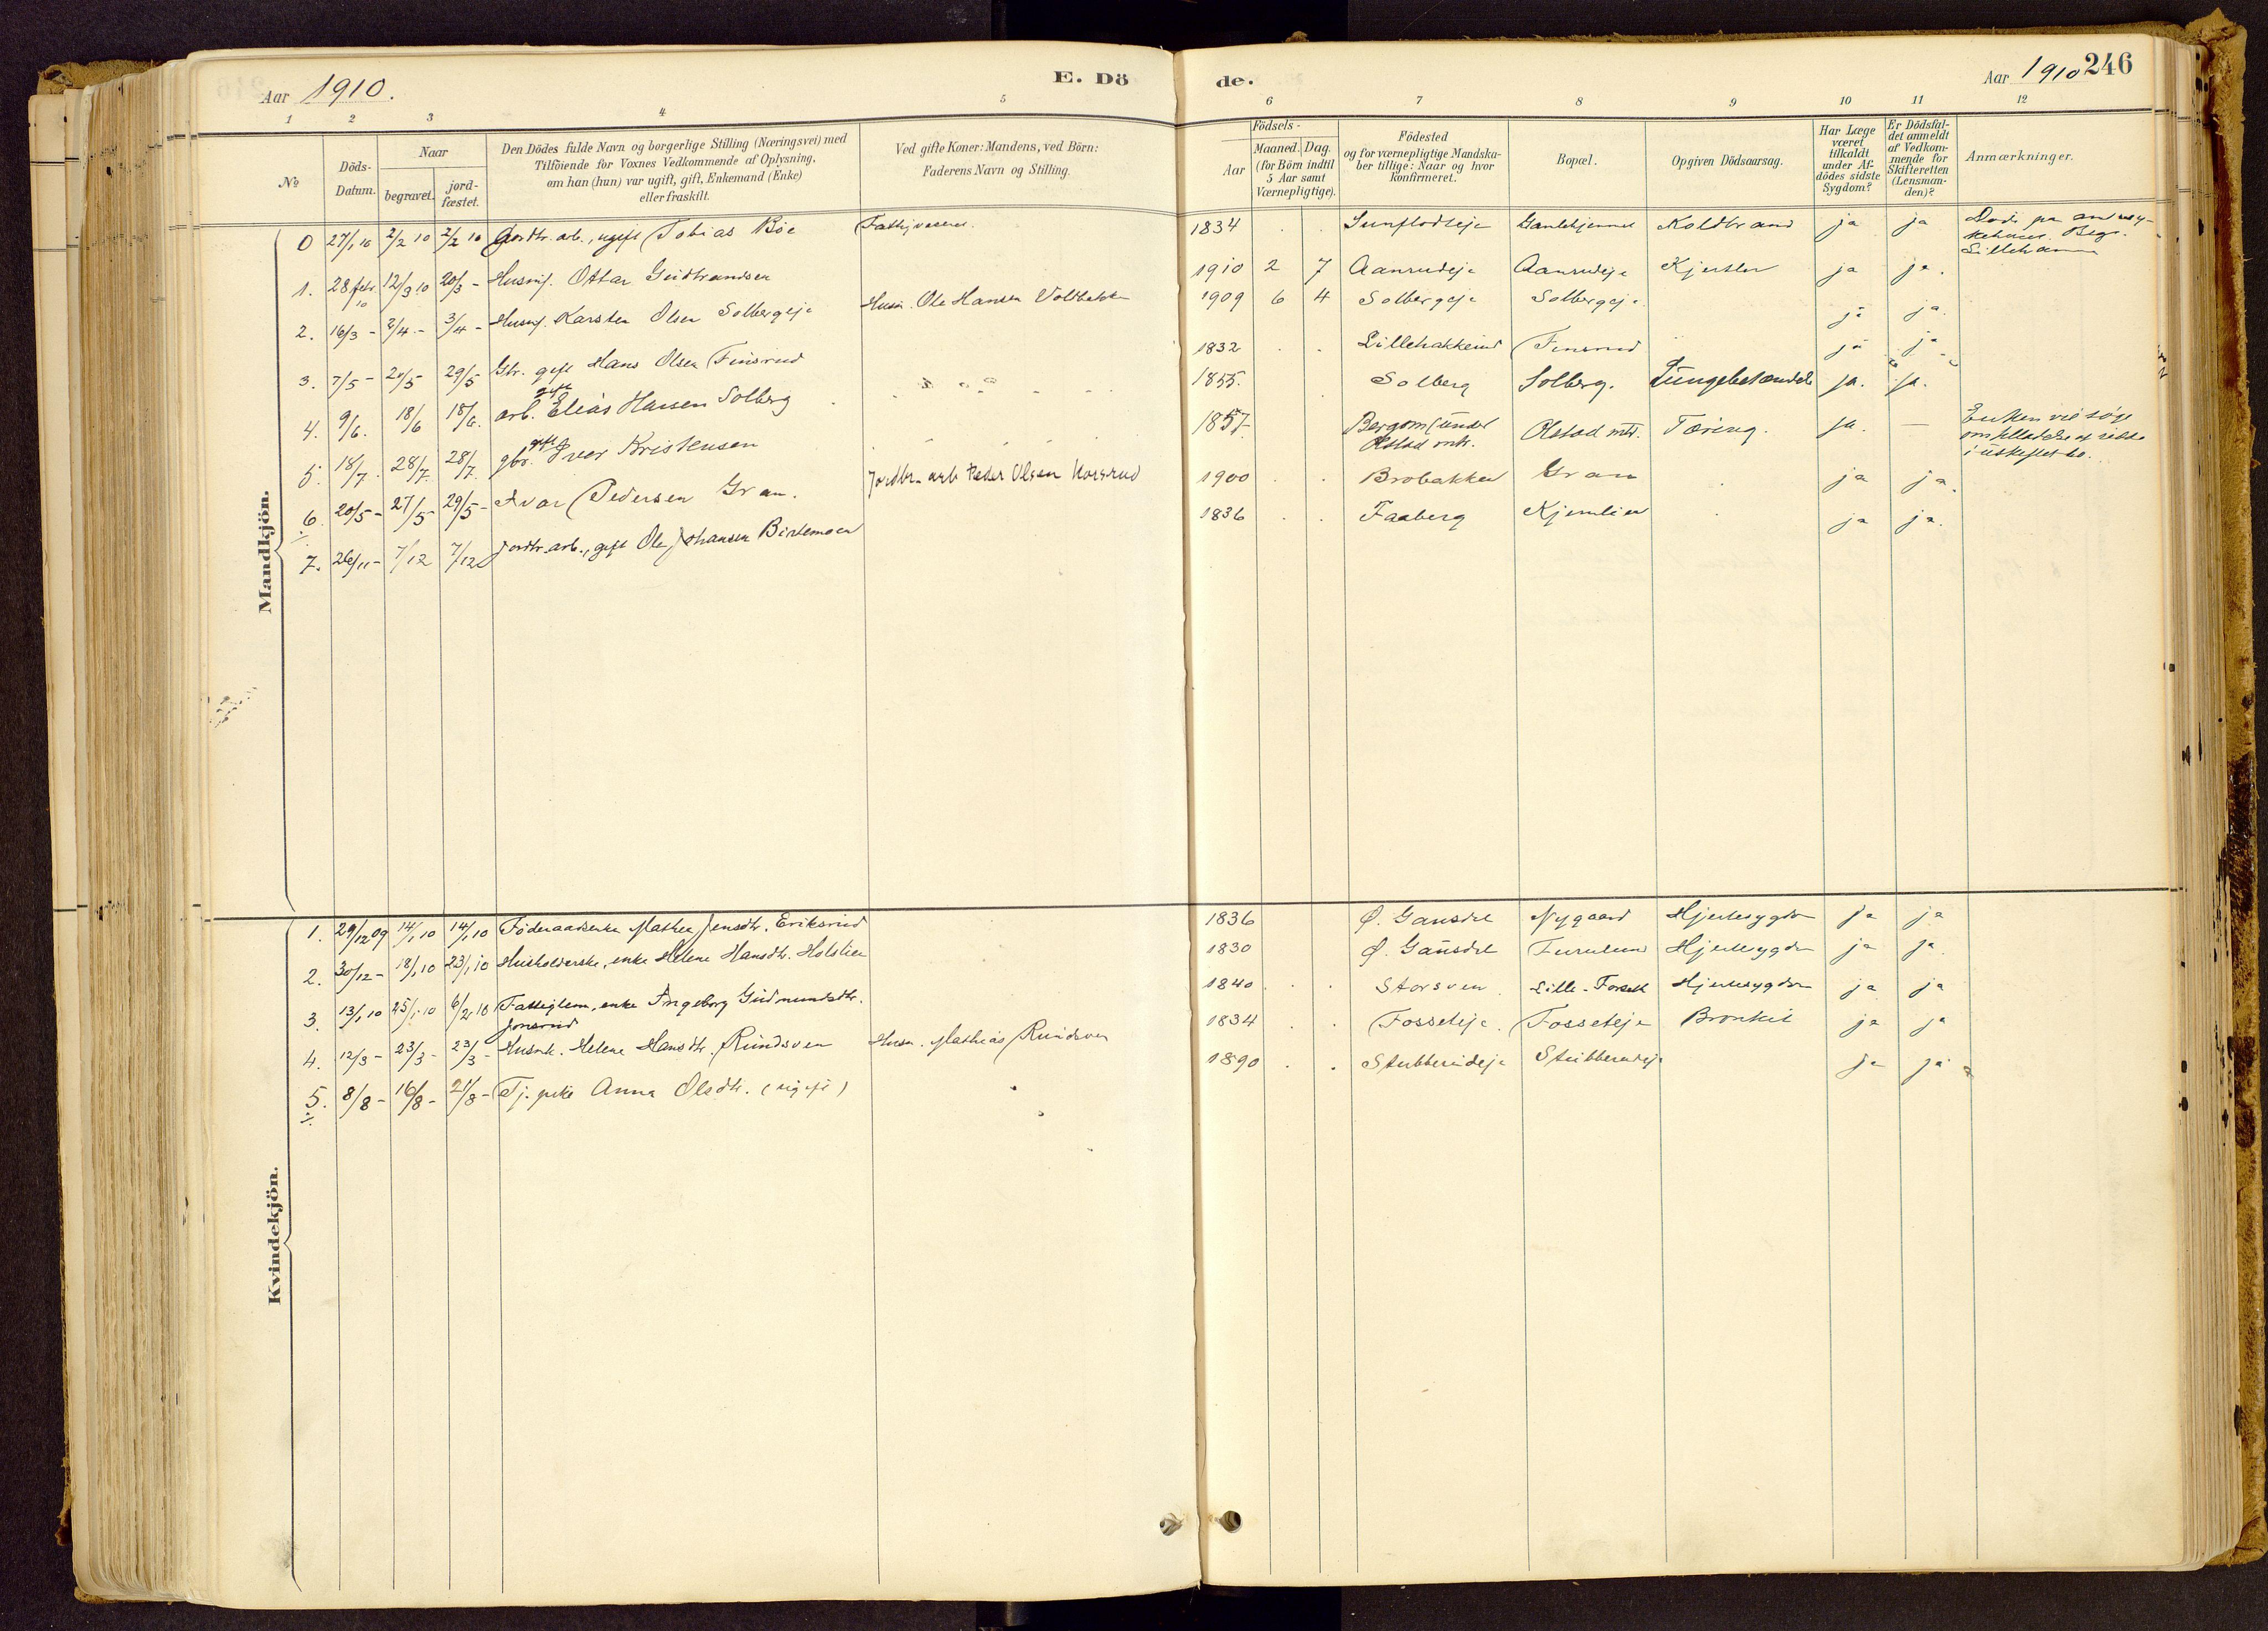 SAH, Vestre Gausdal prestekontor, Ministerialbok nr. 1, 1887-1914, s. 246